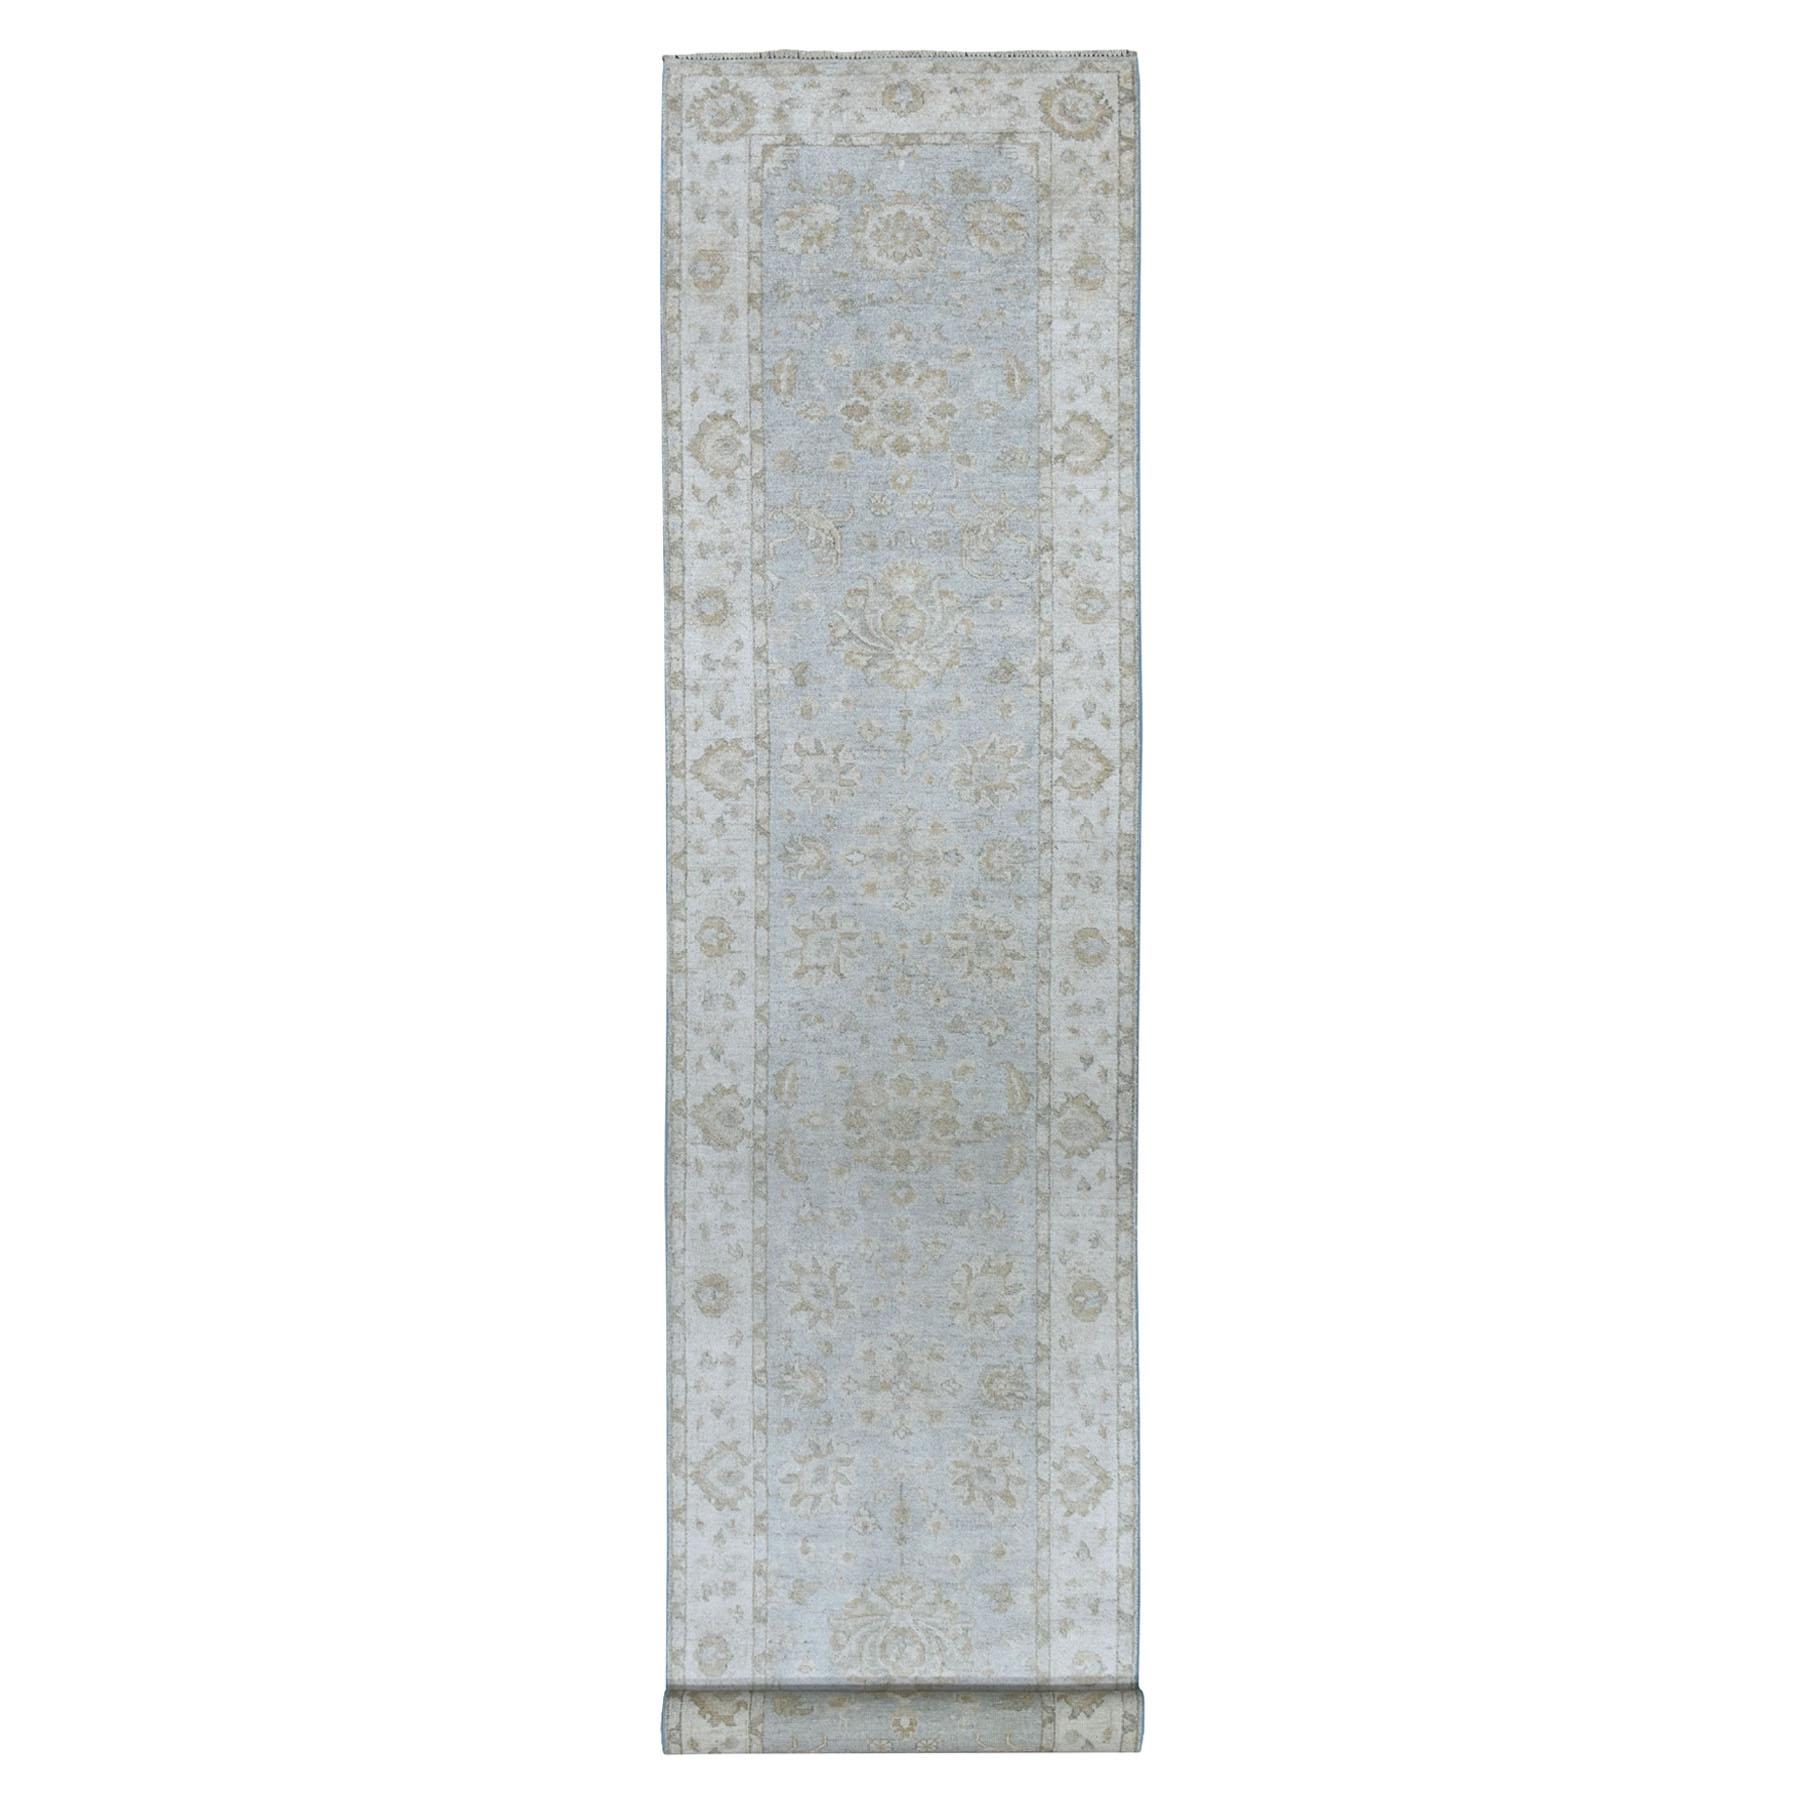 "2'8""X12'8"" White Wash Peshawar Pure Wool Hand Knotted Runner Oriental Rug moaeacdd"